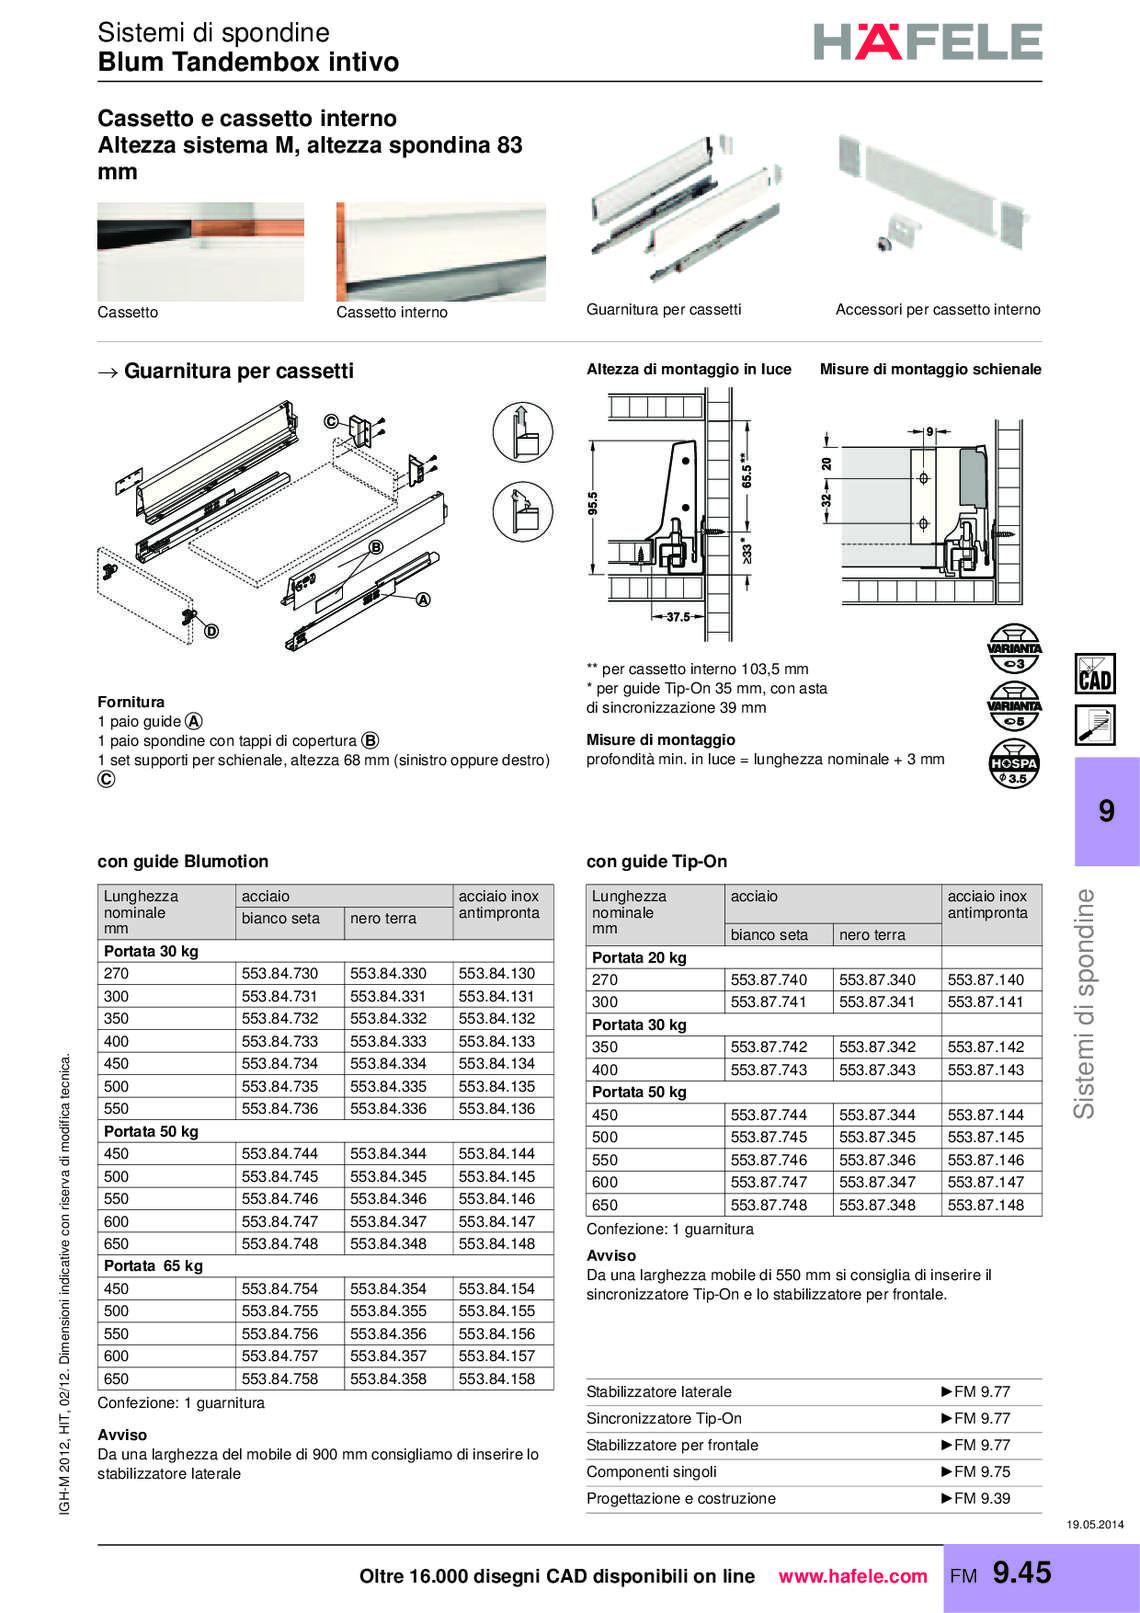 hafele-spondine-e-guide-per-mobili_40_056.jpg